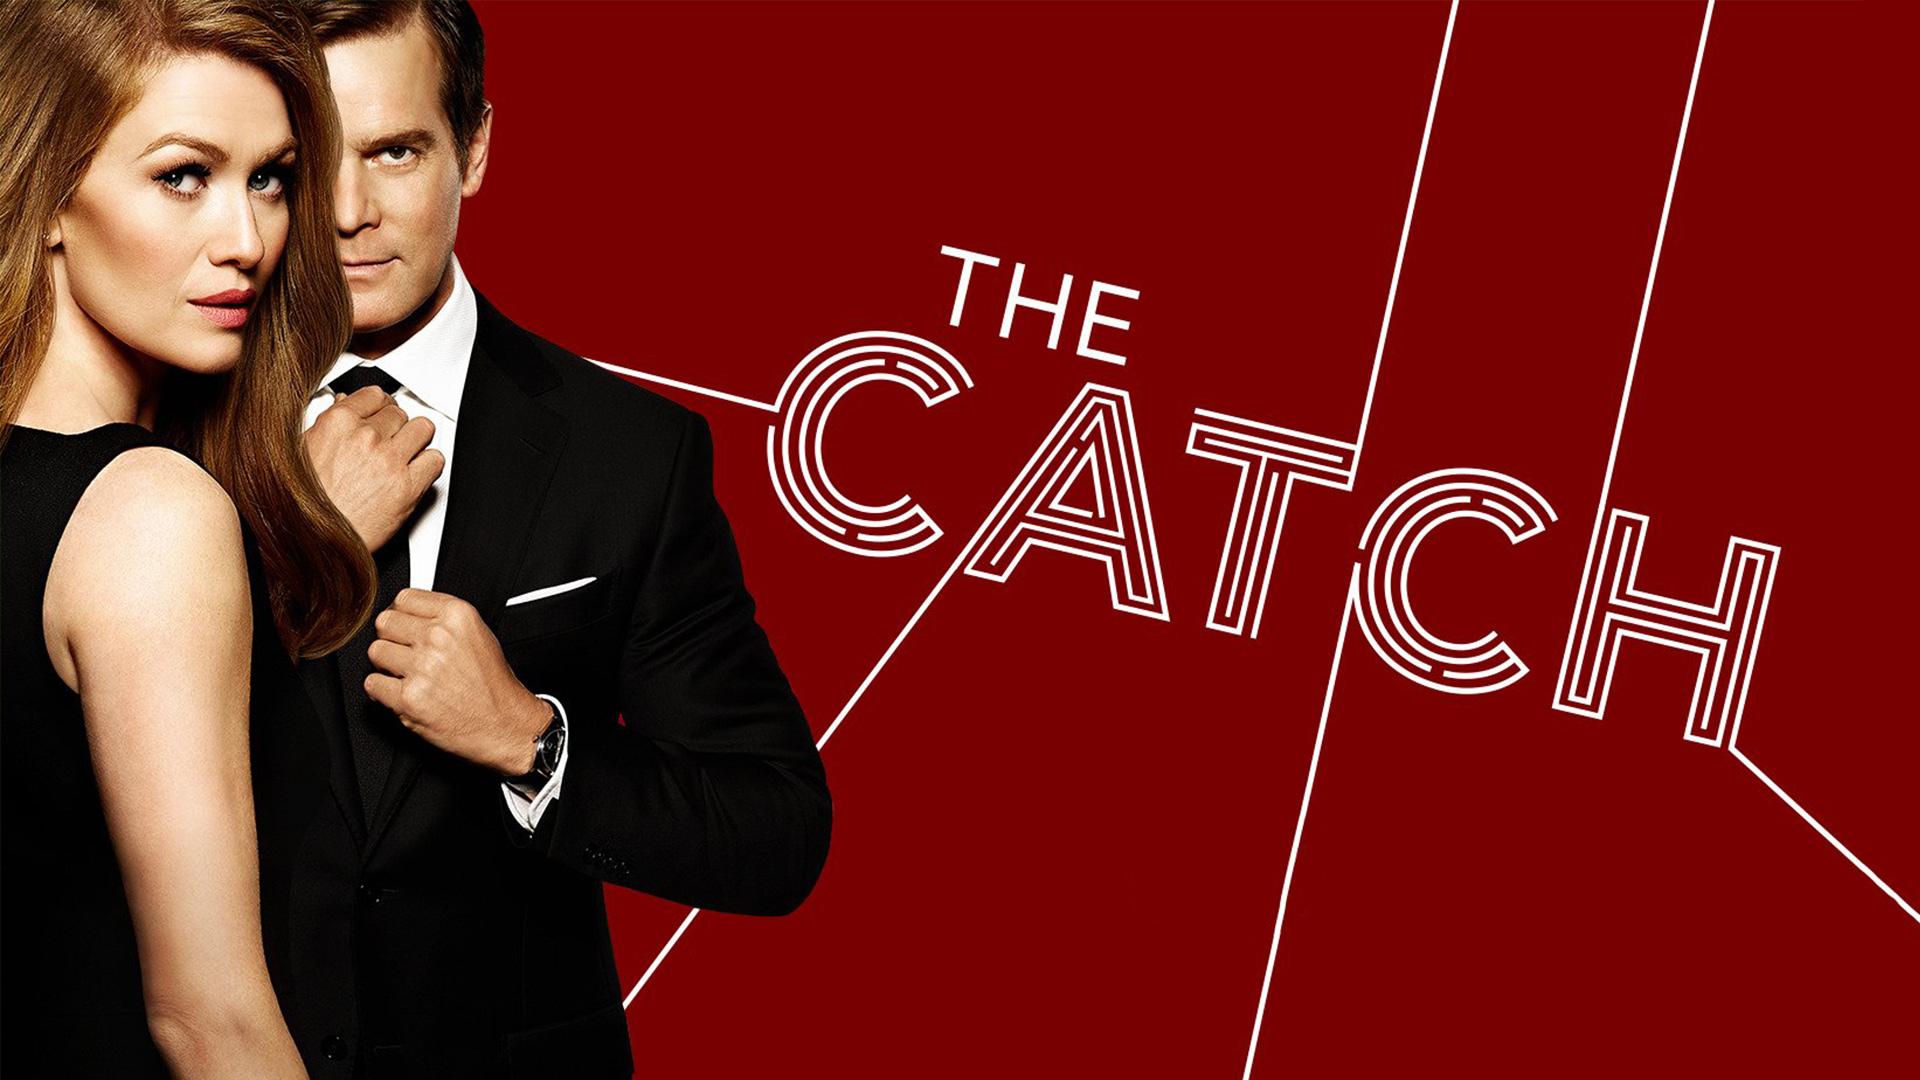 The Catch Season 1